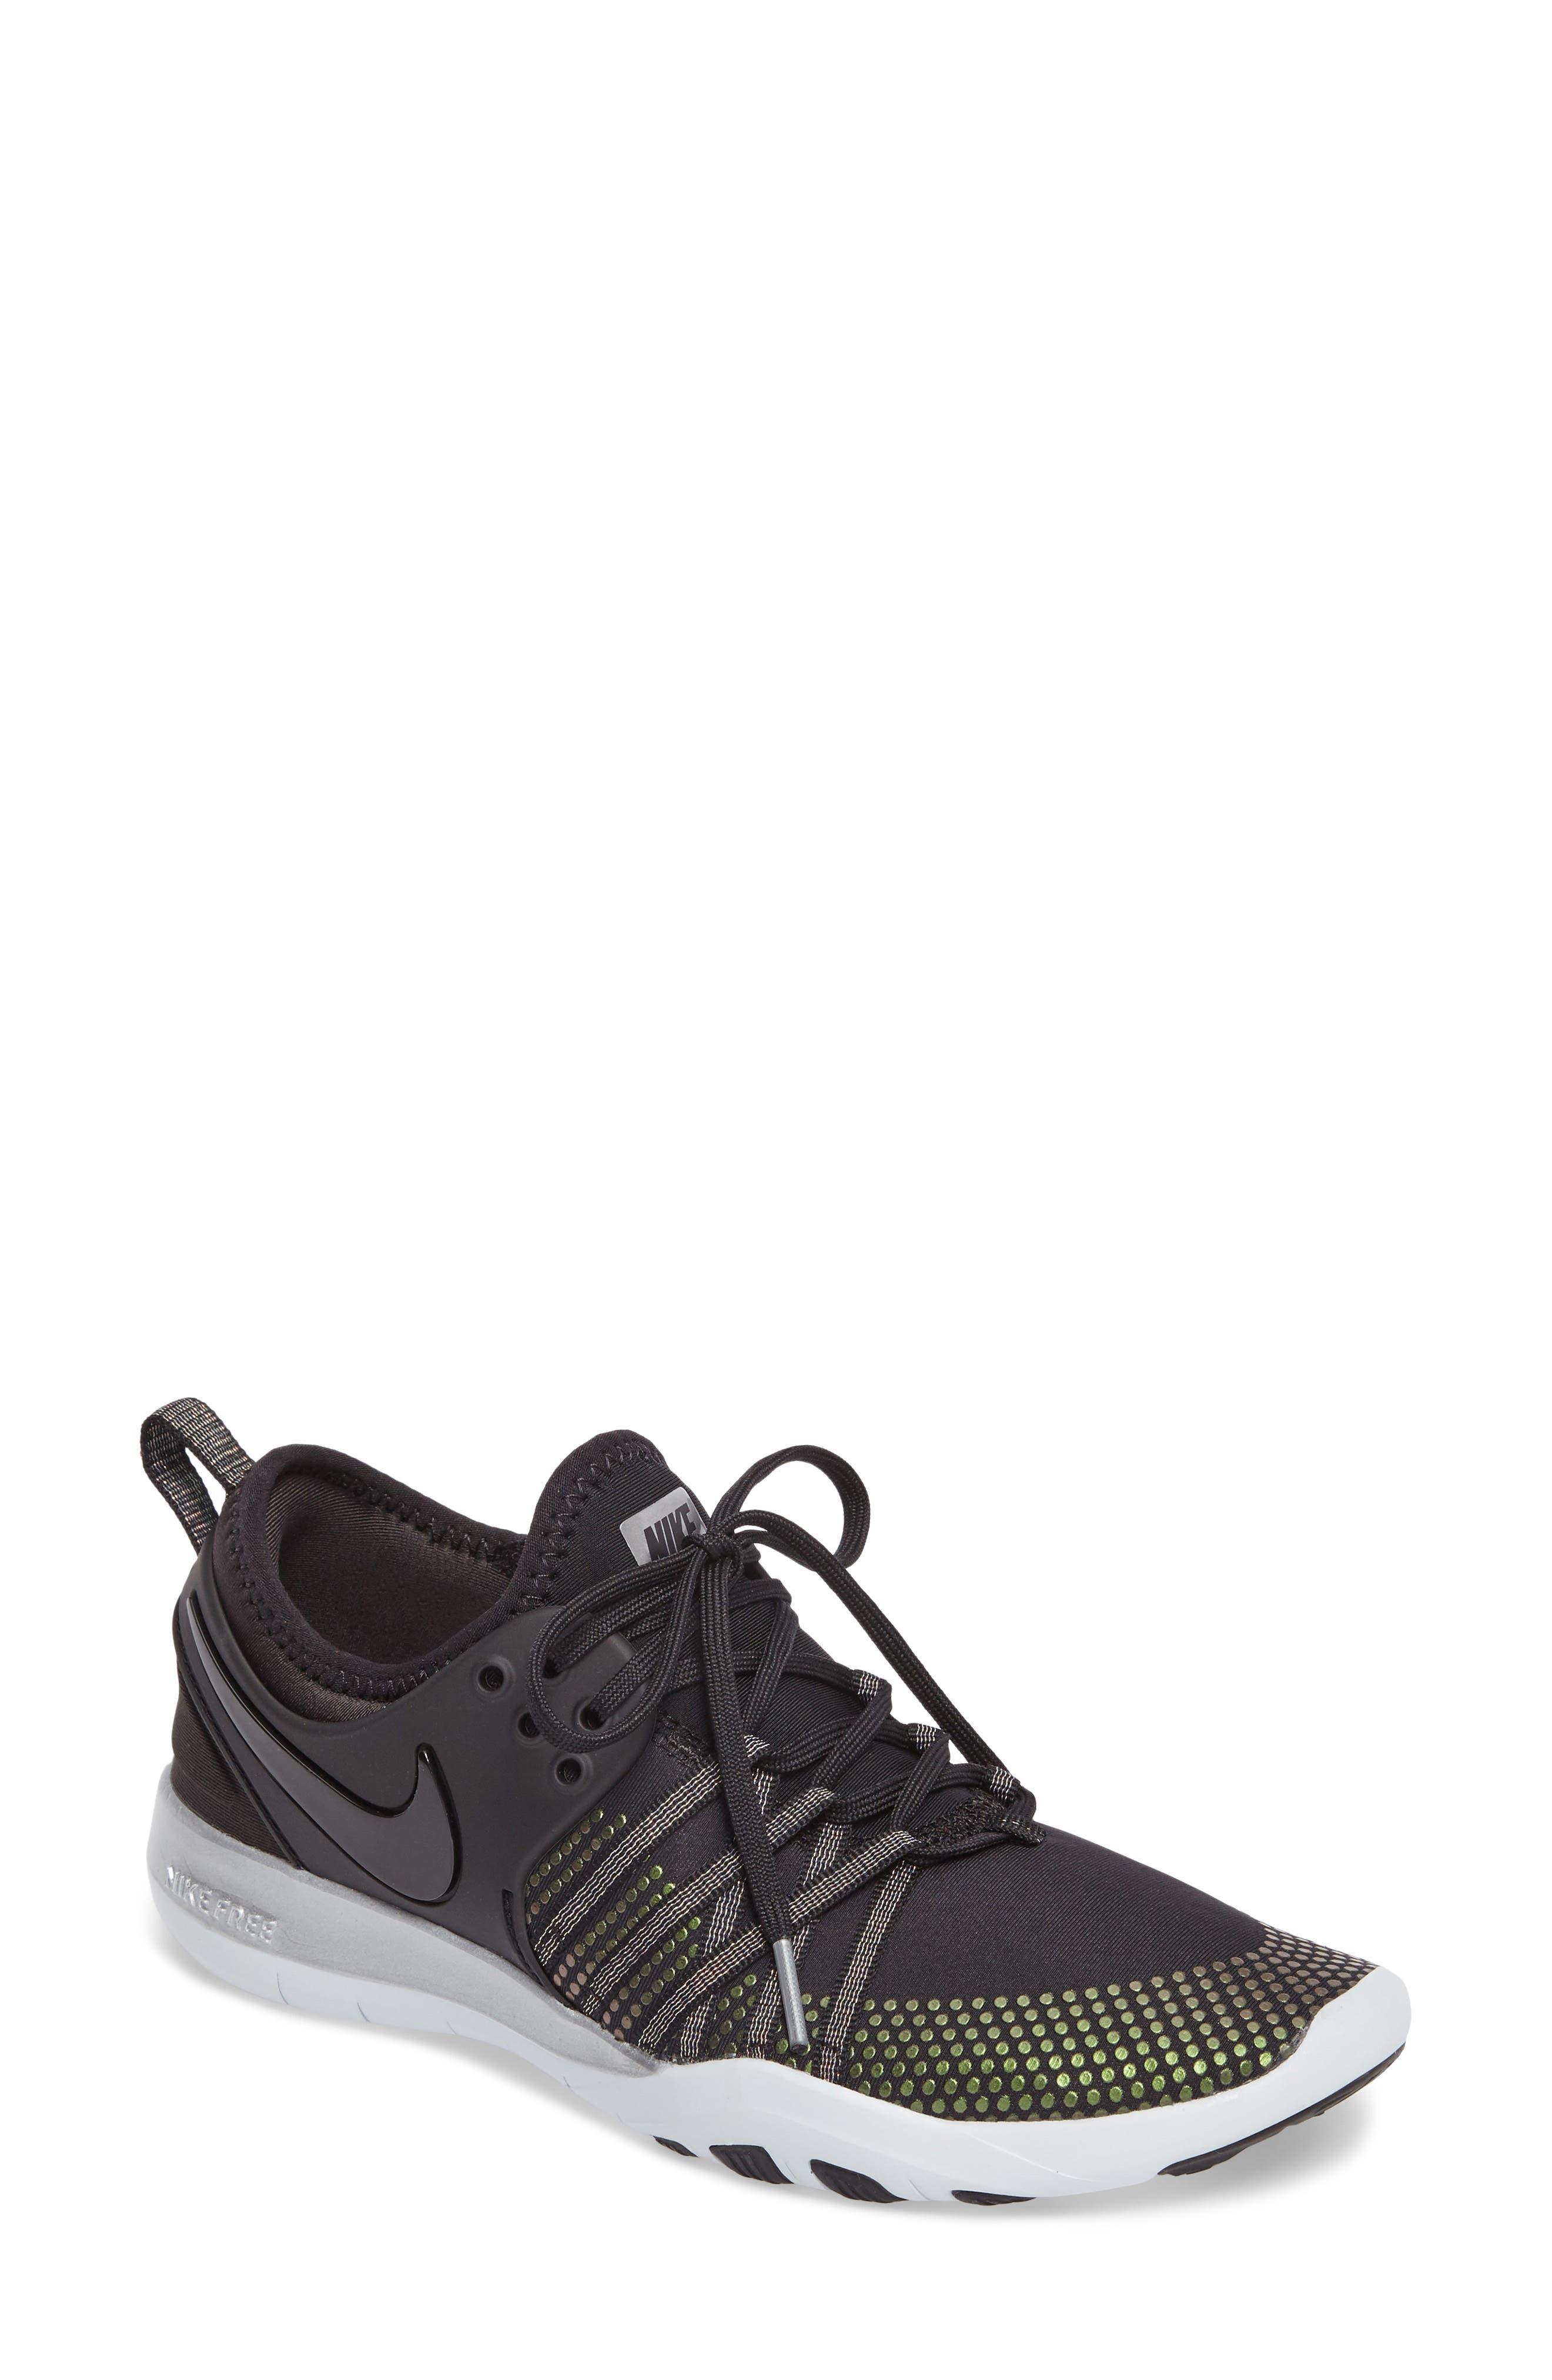 Free TR 7 Metallic Training Shoe,                         Main,                         color, Black/ Black/ Pure Platinum